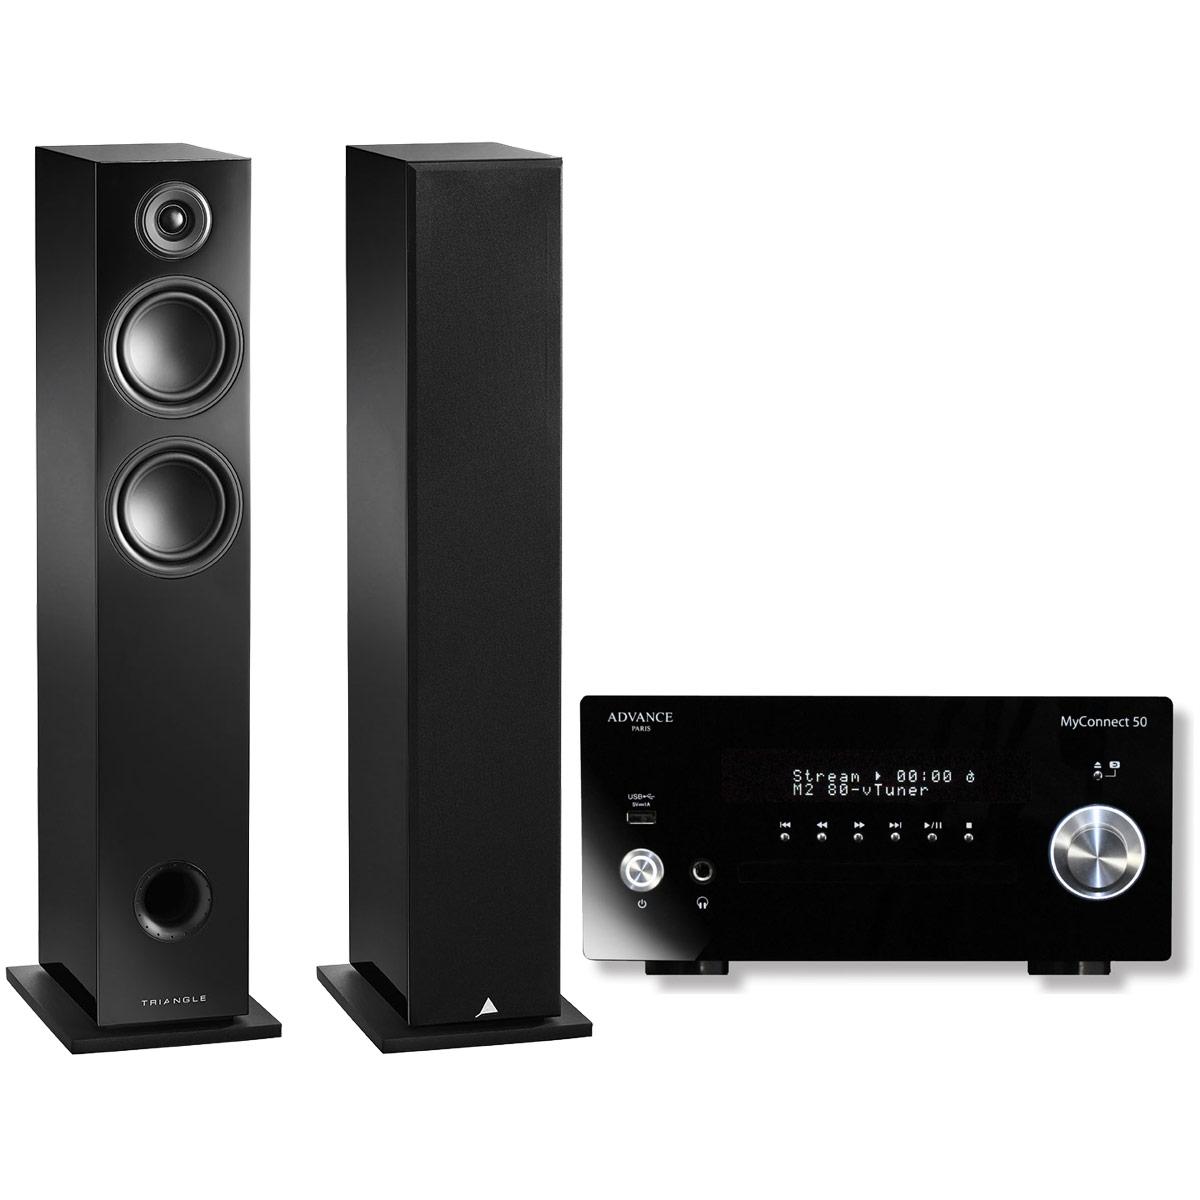 Chaîne Hifi Advance Acoustic MyConnect 50 + Triangle Elara LN05 Noir Laqué Micro-chaîne 2 x 70 Watts CD/FM - Wi-Fi/Bluetooth - AirPlay - Multiroom (sans haut-parleurs) + Enceinte colonne 90 W Bass-Reflex (par paire)